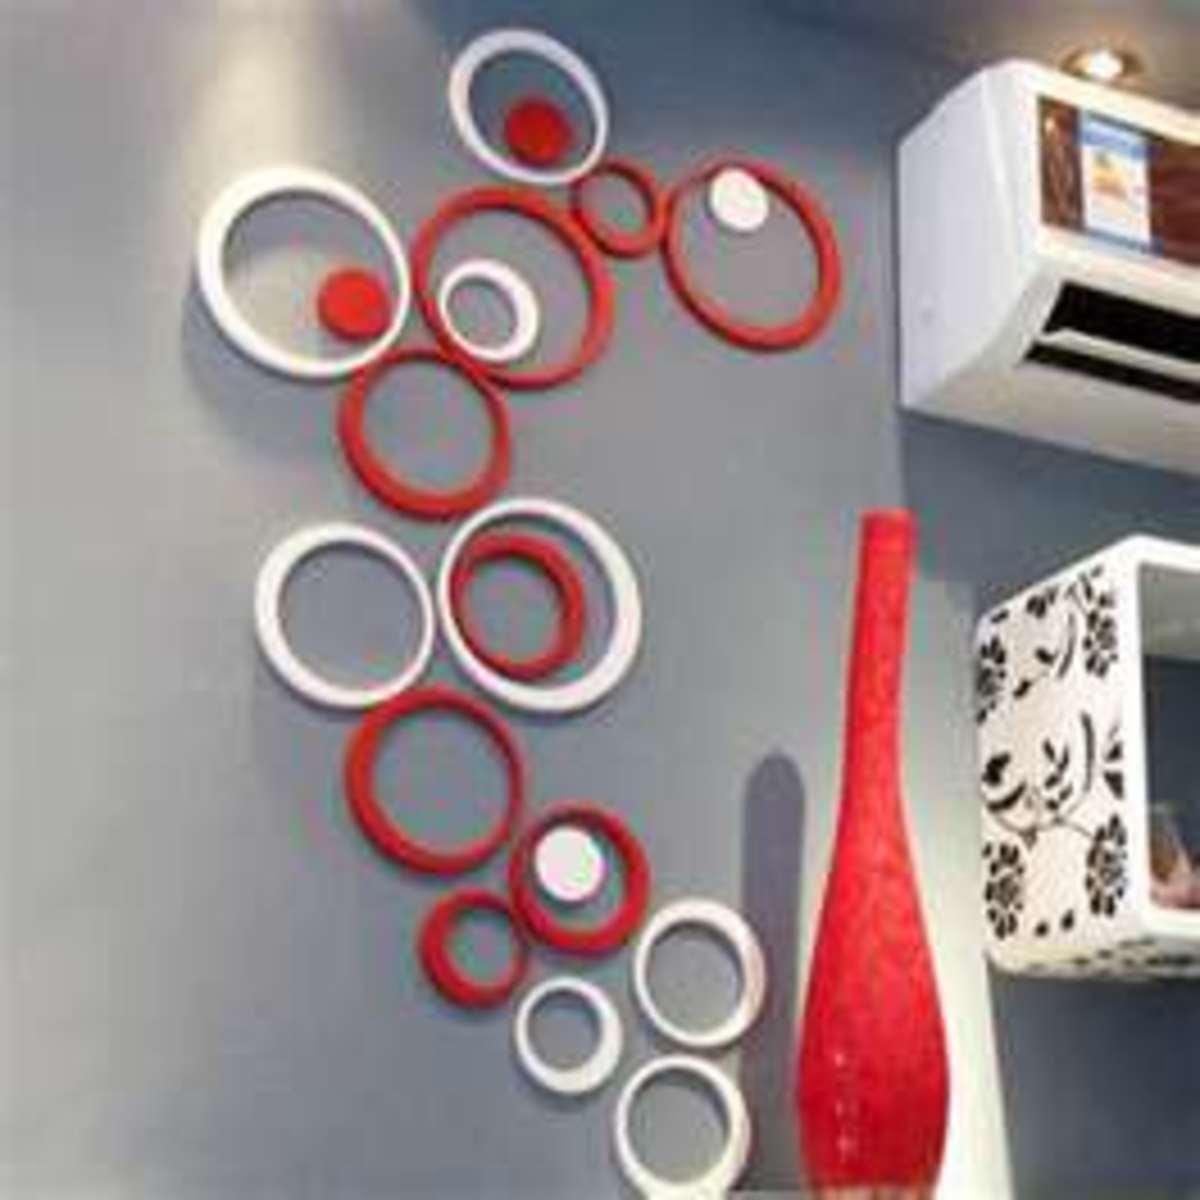 Image credit: http://luxury-idea.com/furniture/2010/05/decorating-ideas/